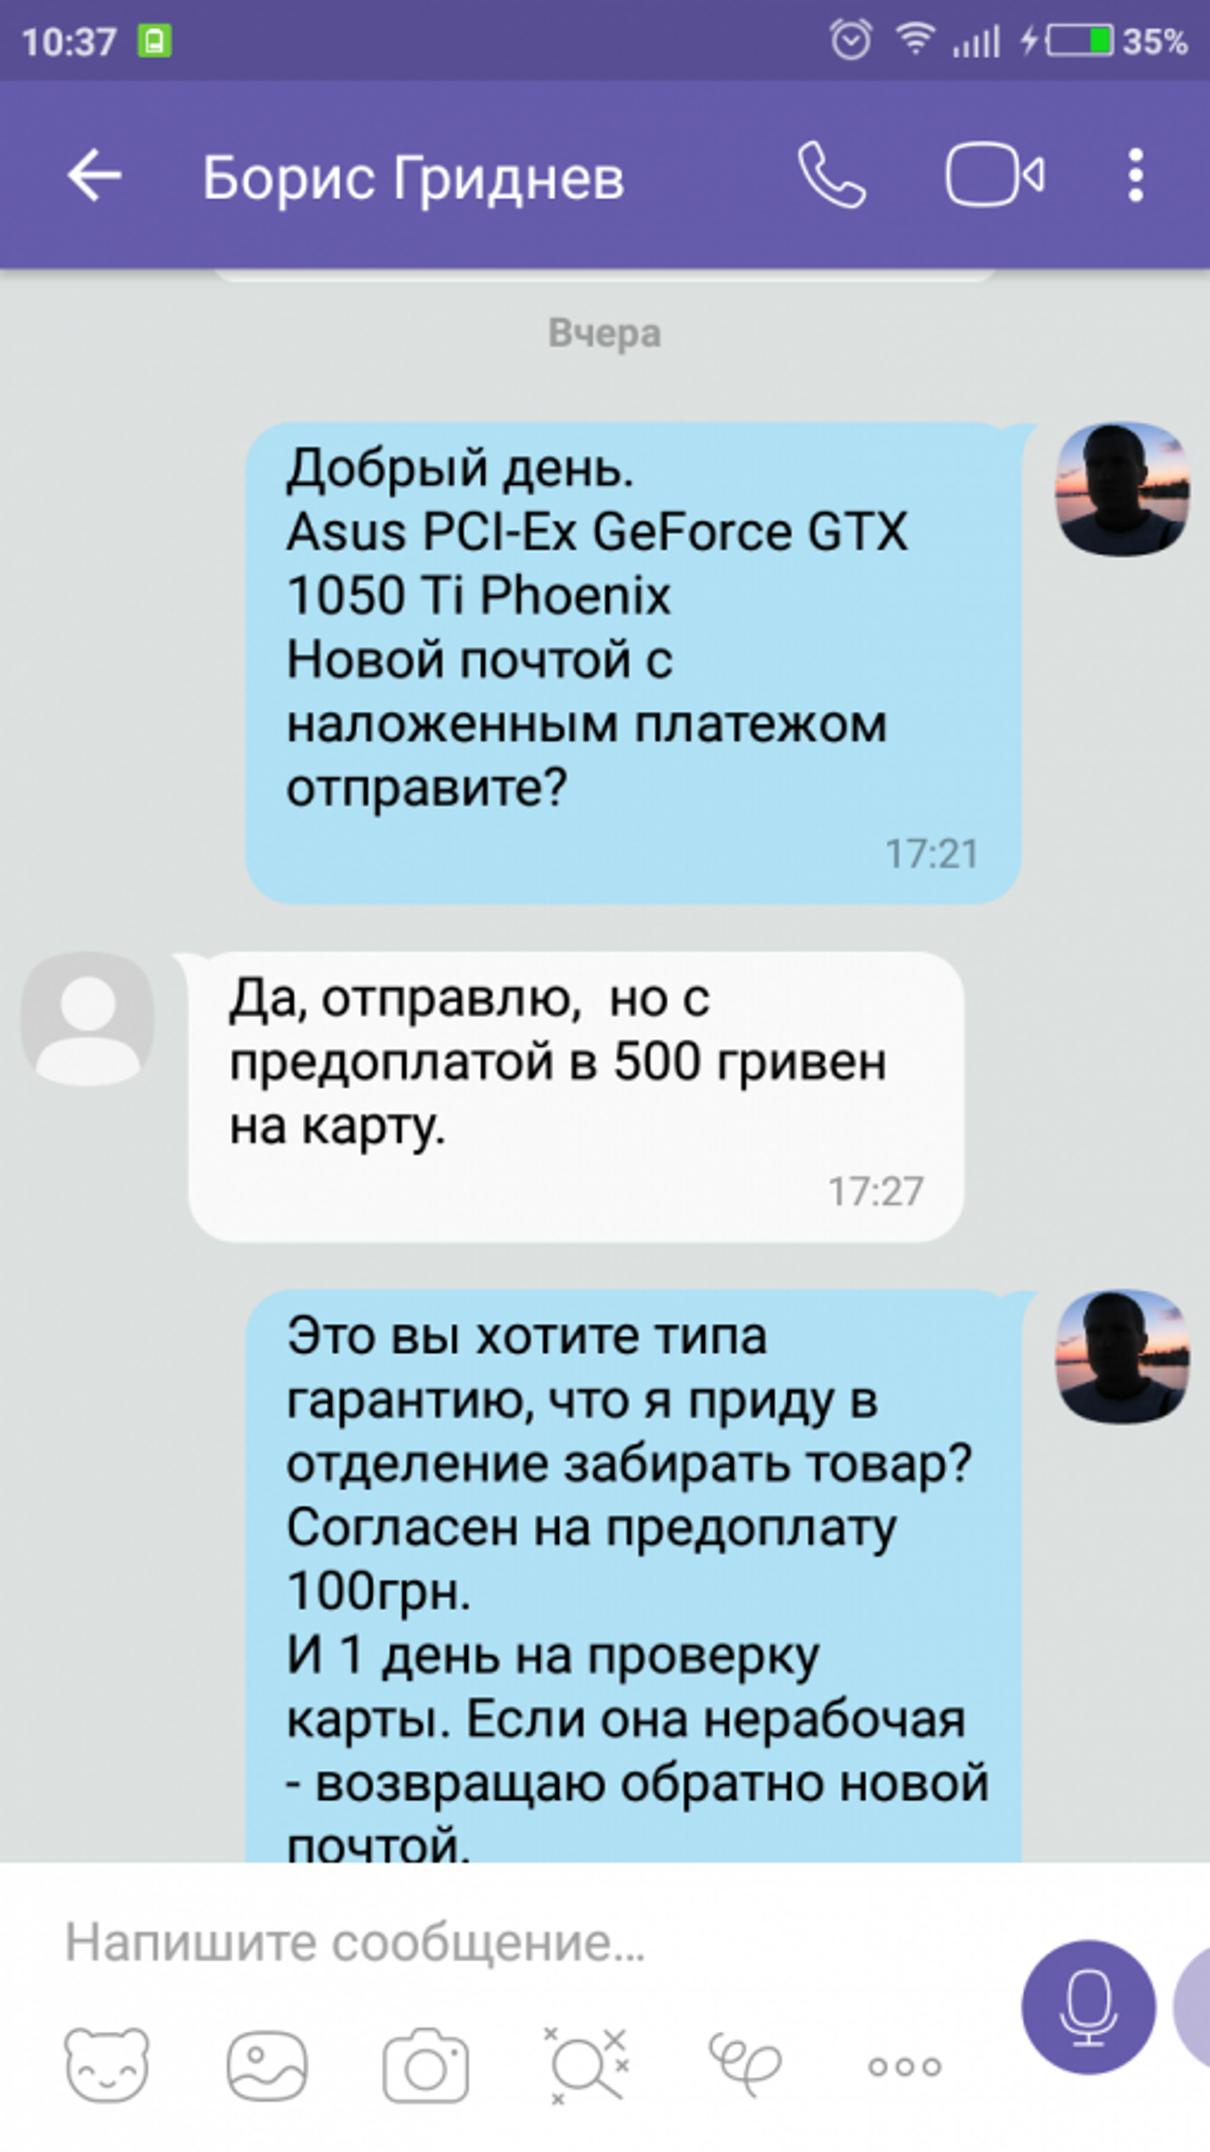 Жалоба-отзыв: Борис Гриднев - Мошенник с OLX, кидает на предоплату.  Фото №1